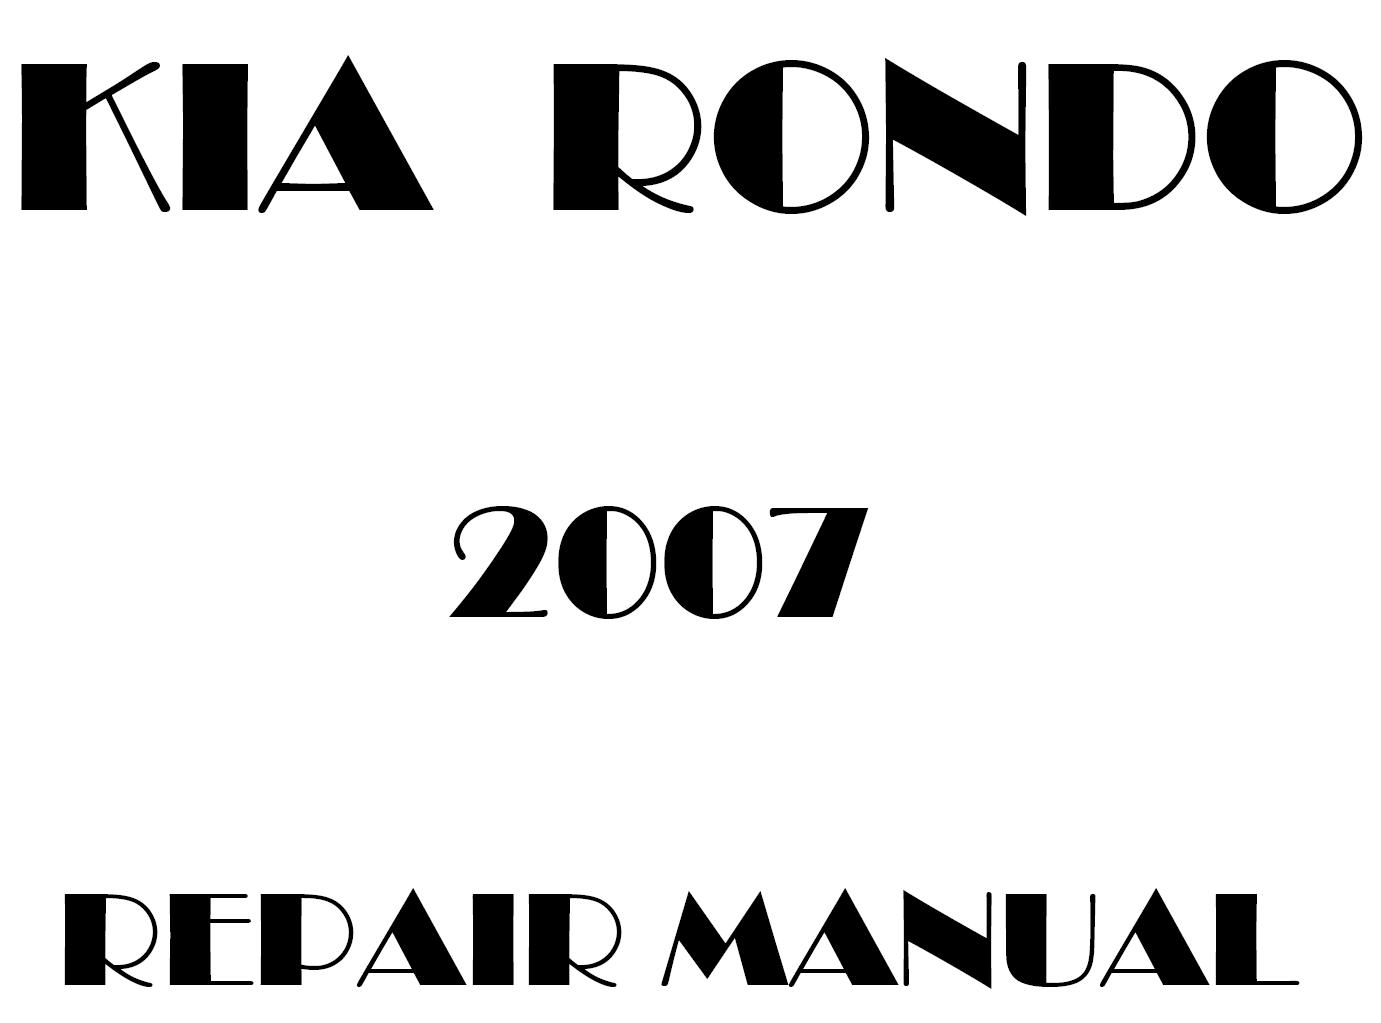 2007 Kia Rondo repair manual